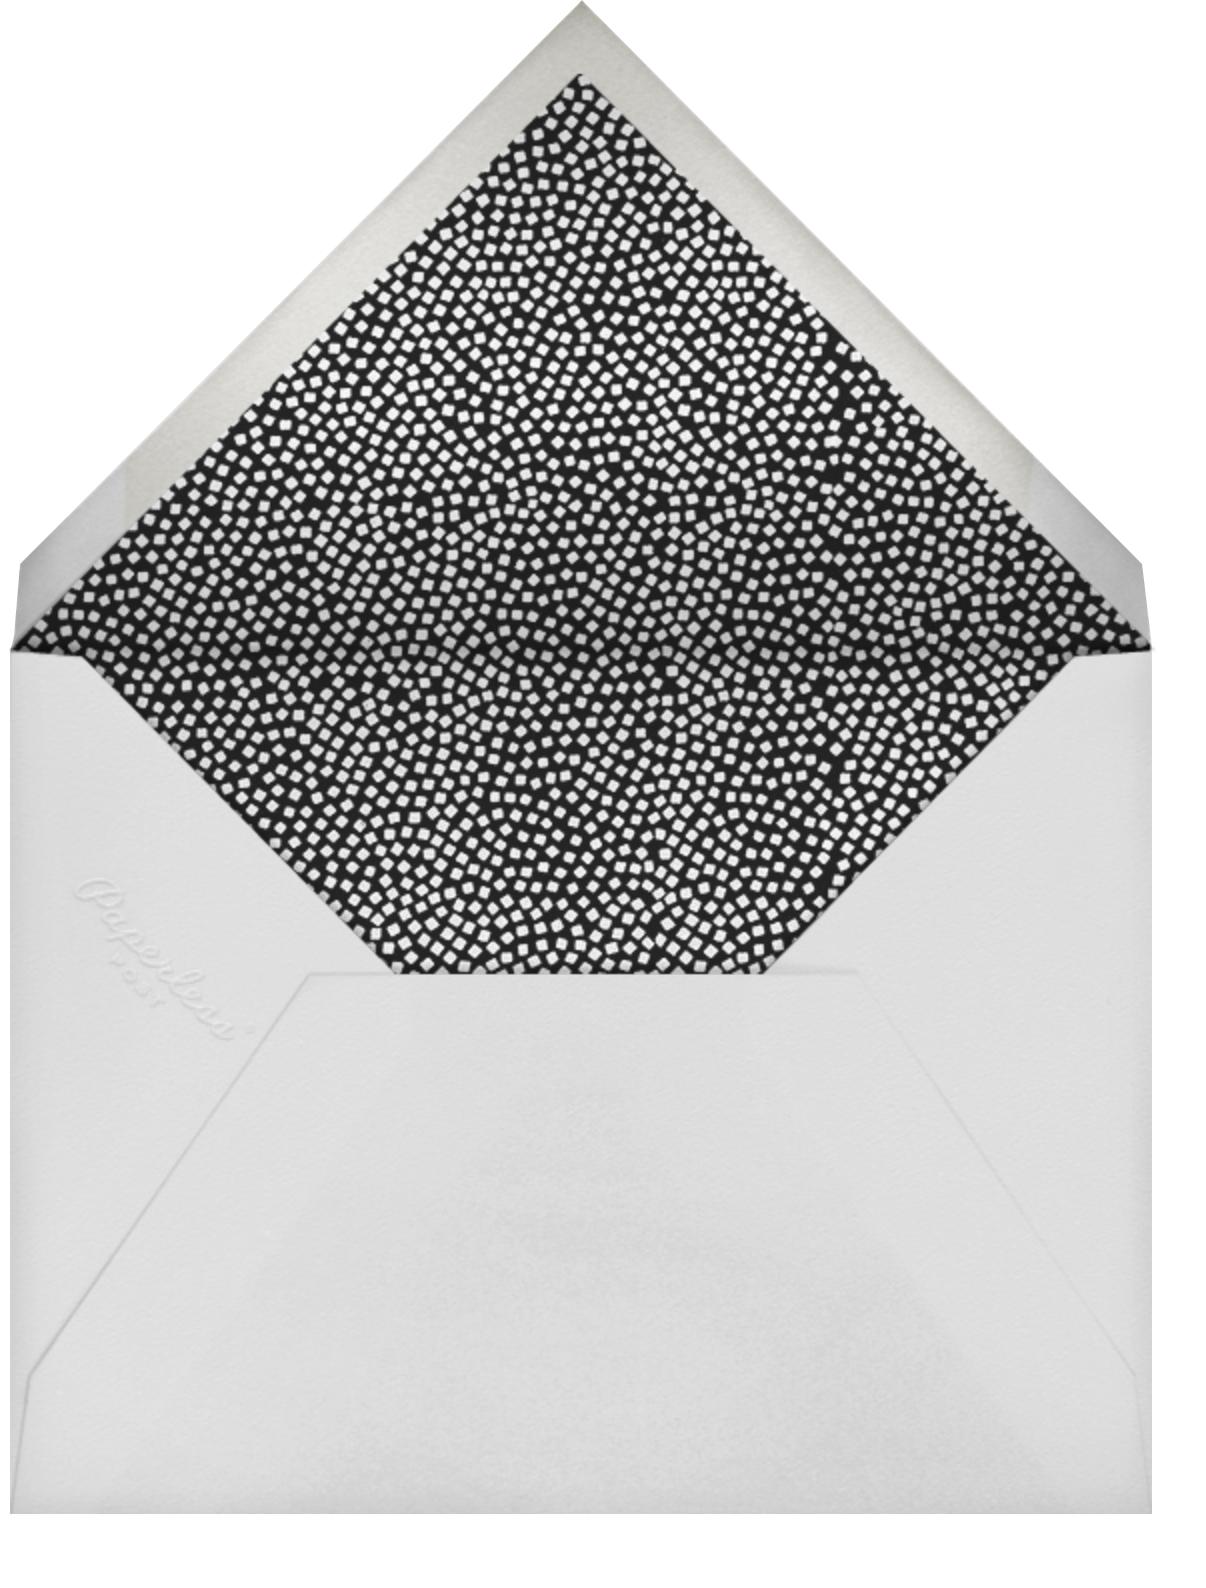 Konfetti - Gold - Kelly Wearstler - Bridal shower - envelope back